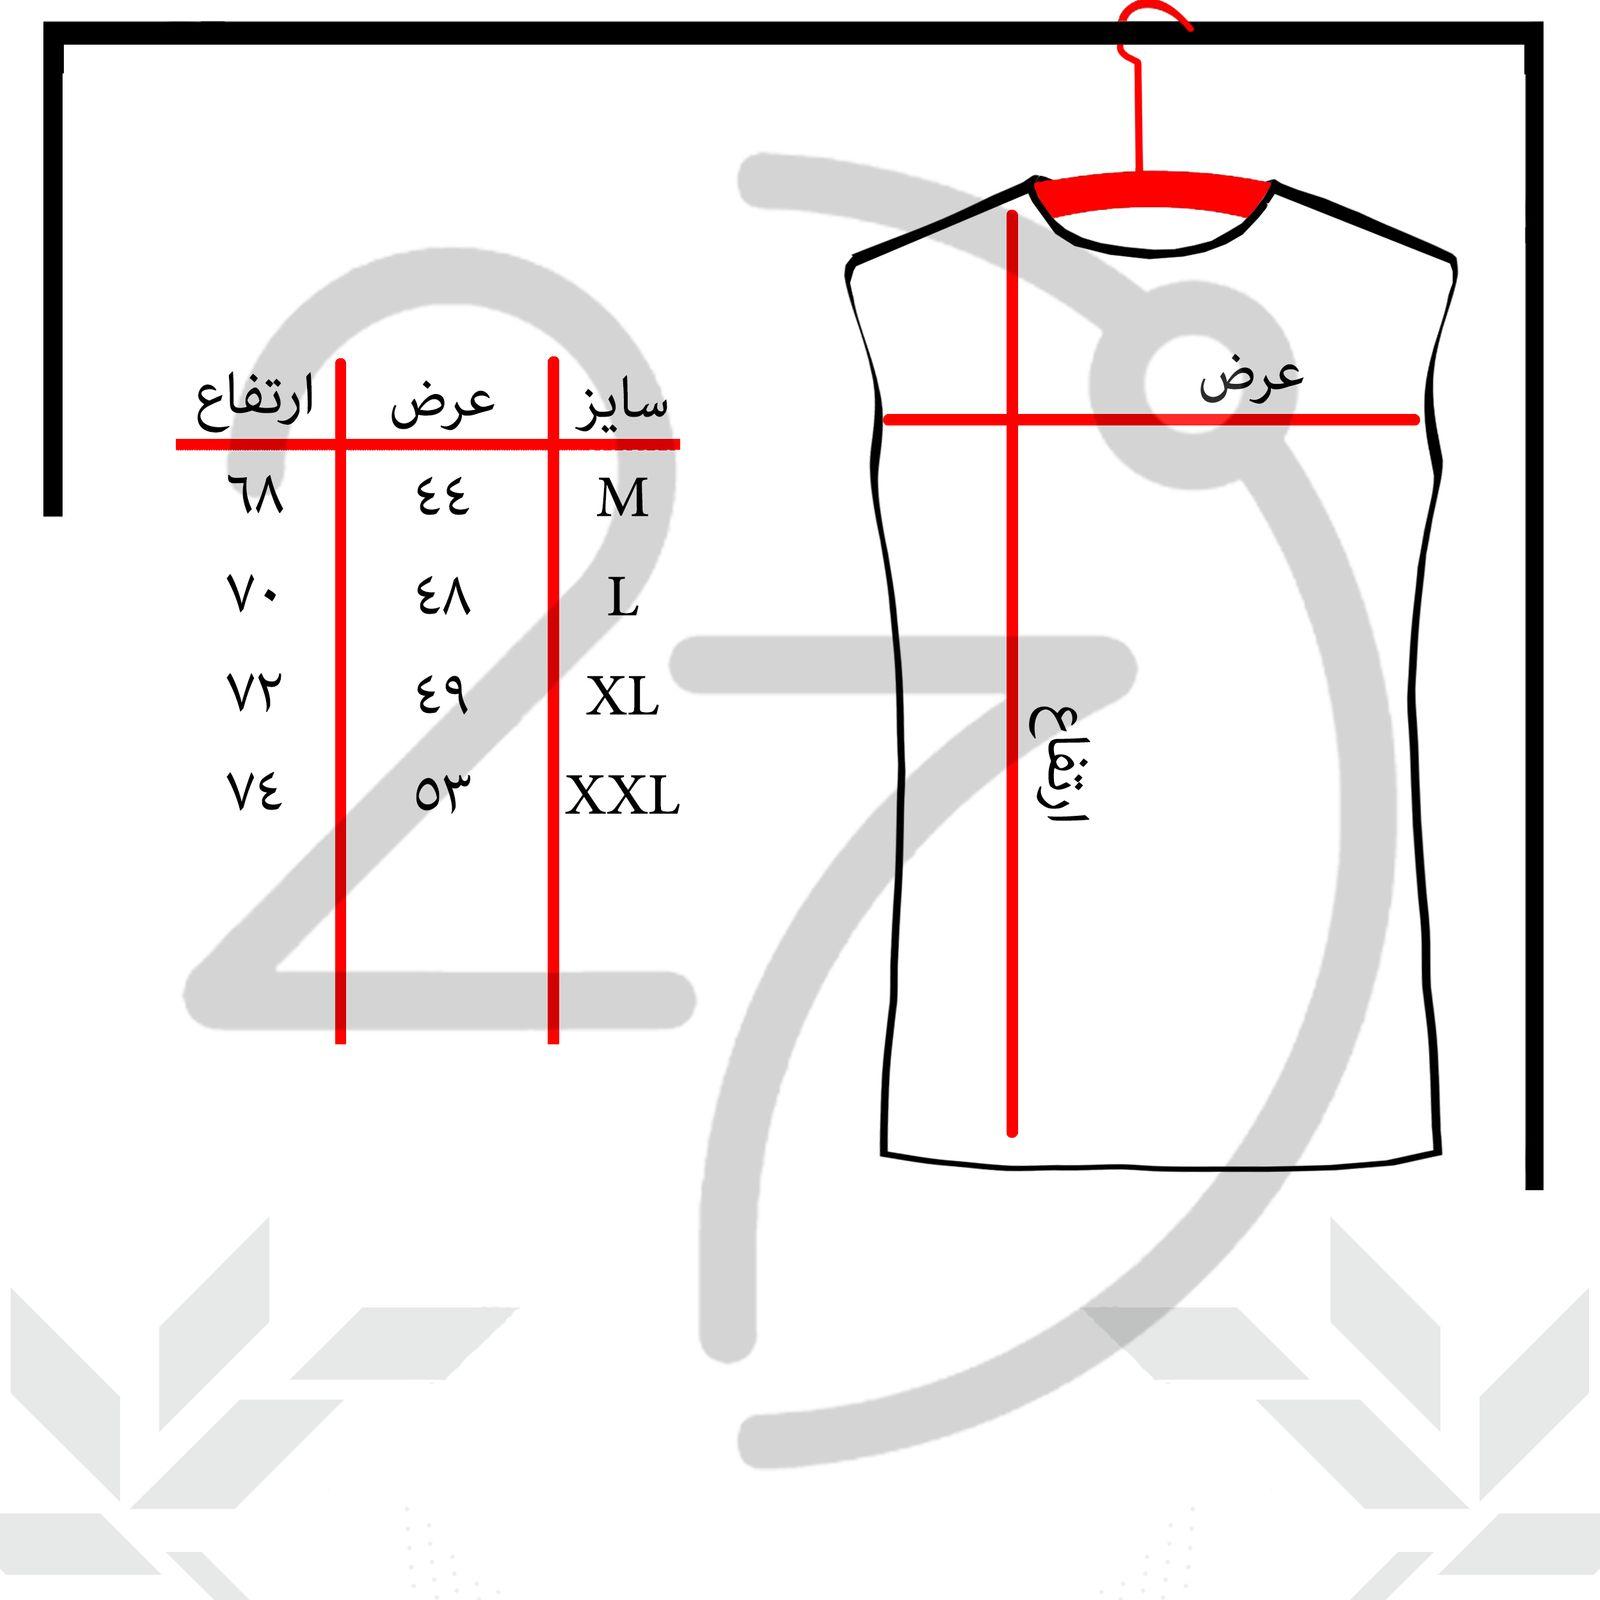 ست تاپ و شلوارک مردانه 27 طرح SELECT STAY STYLISH کد AL15 -  - 4